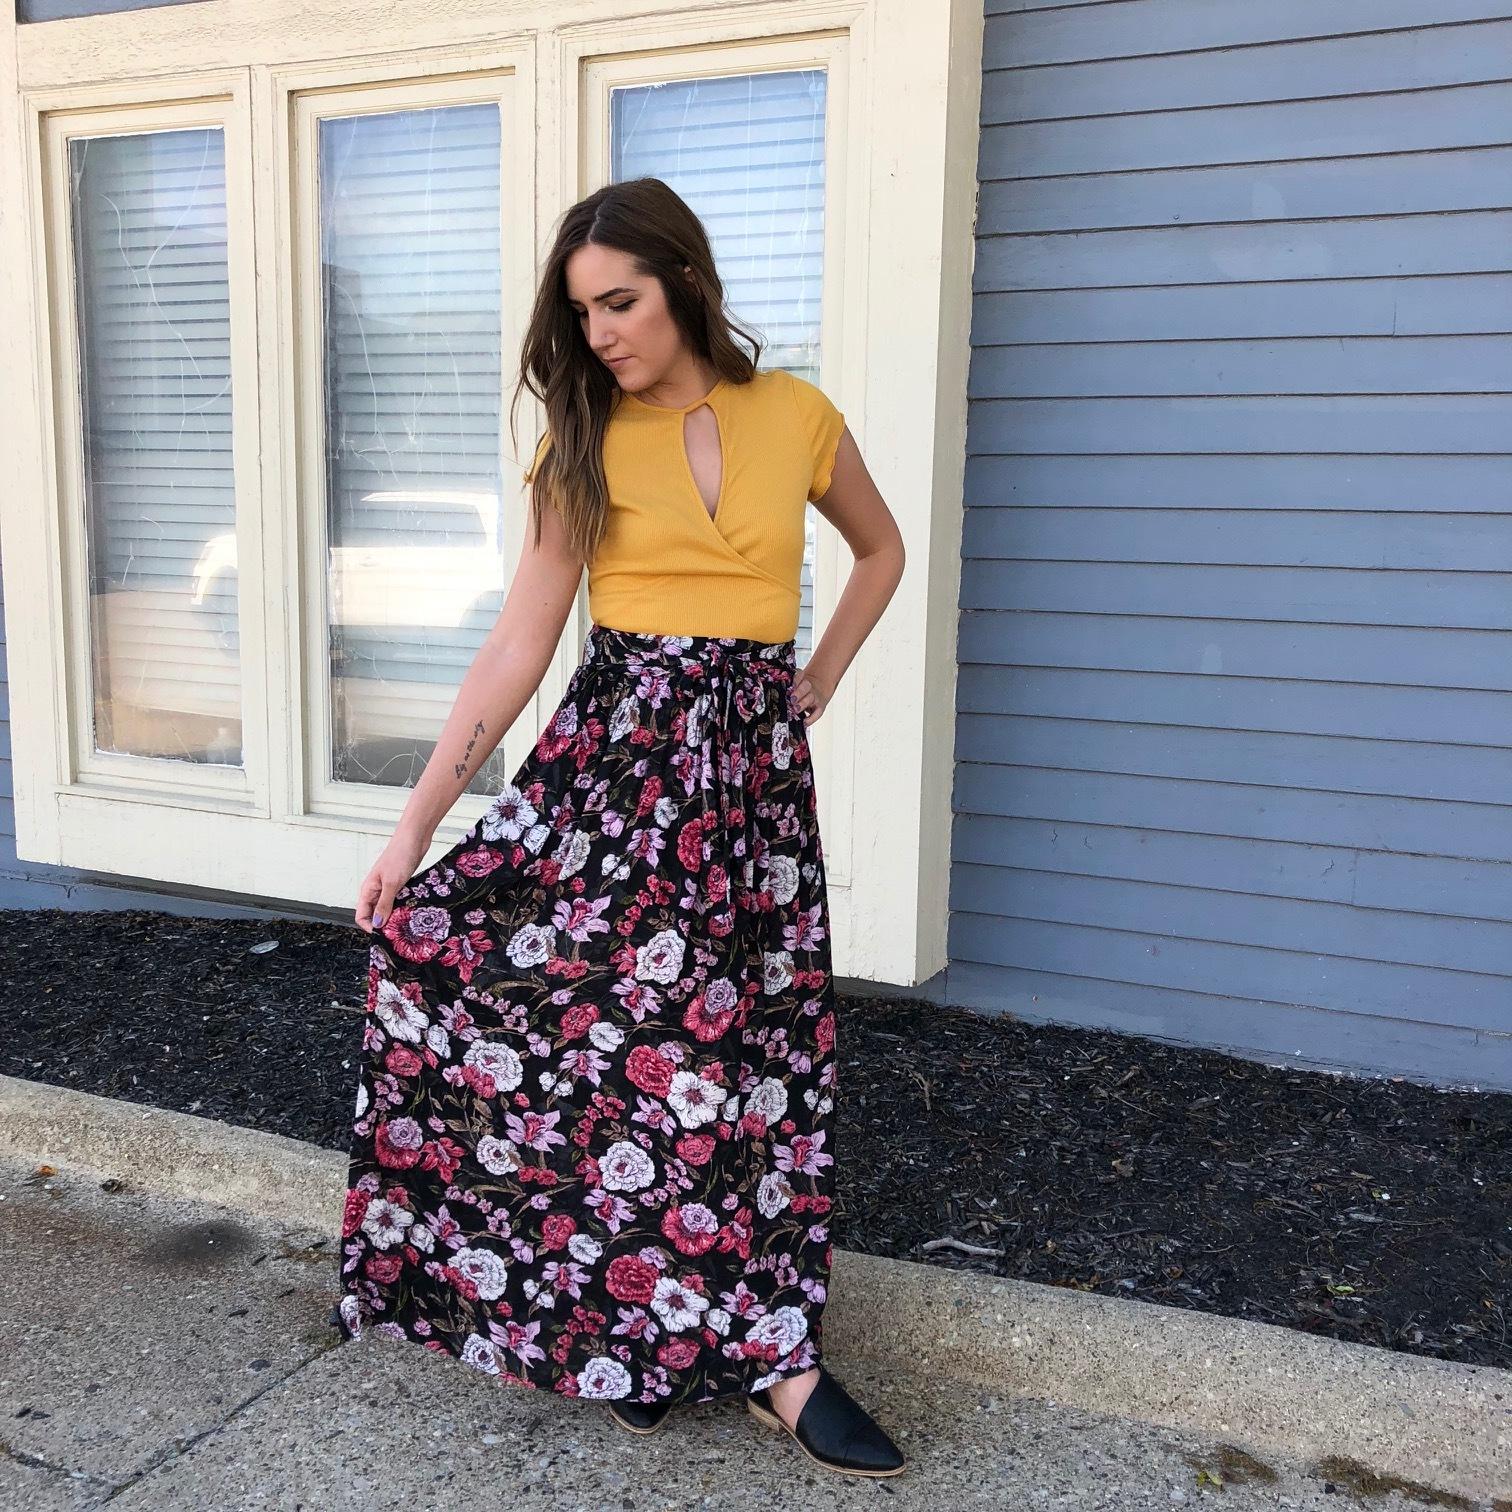 Billabong Floral Maxi Skirt $49.95, She & Sky Yellow Crop Top $32, Black Sidecut Loafers $42